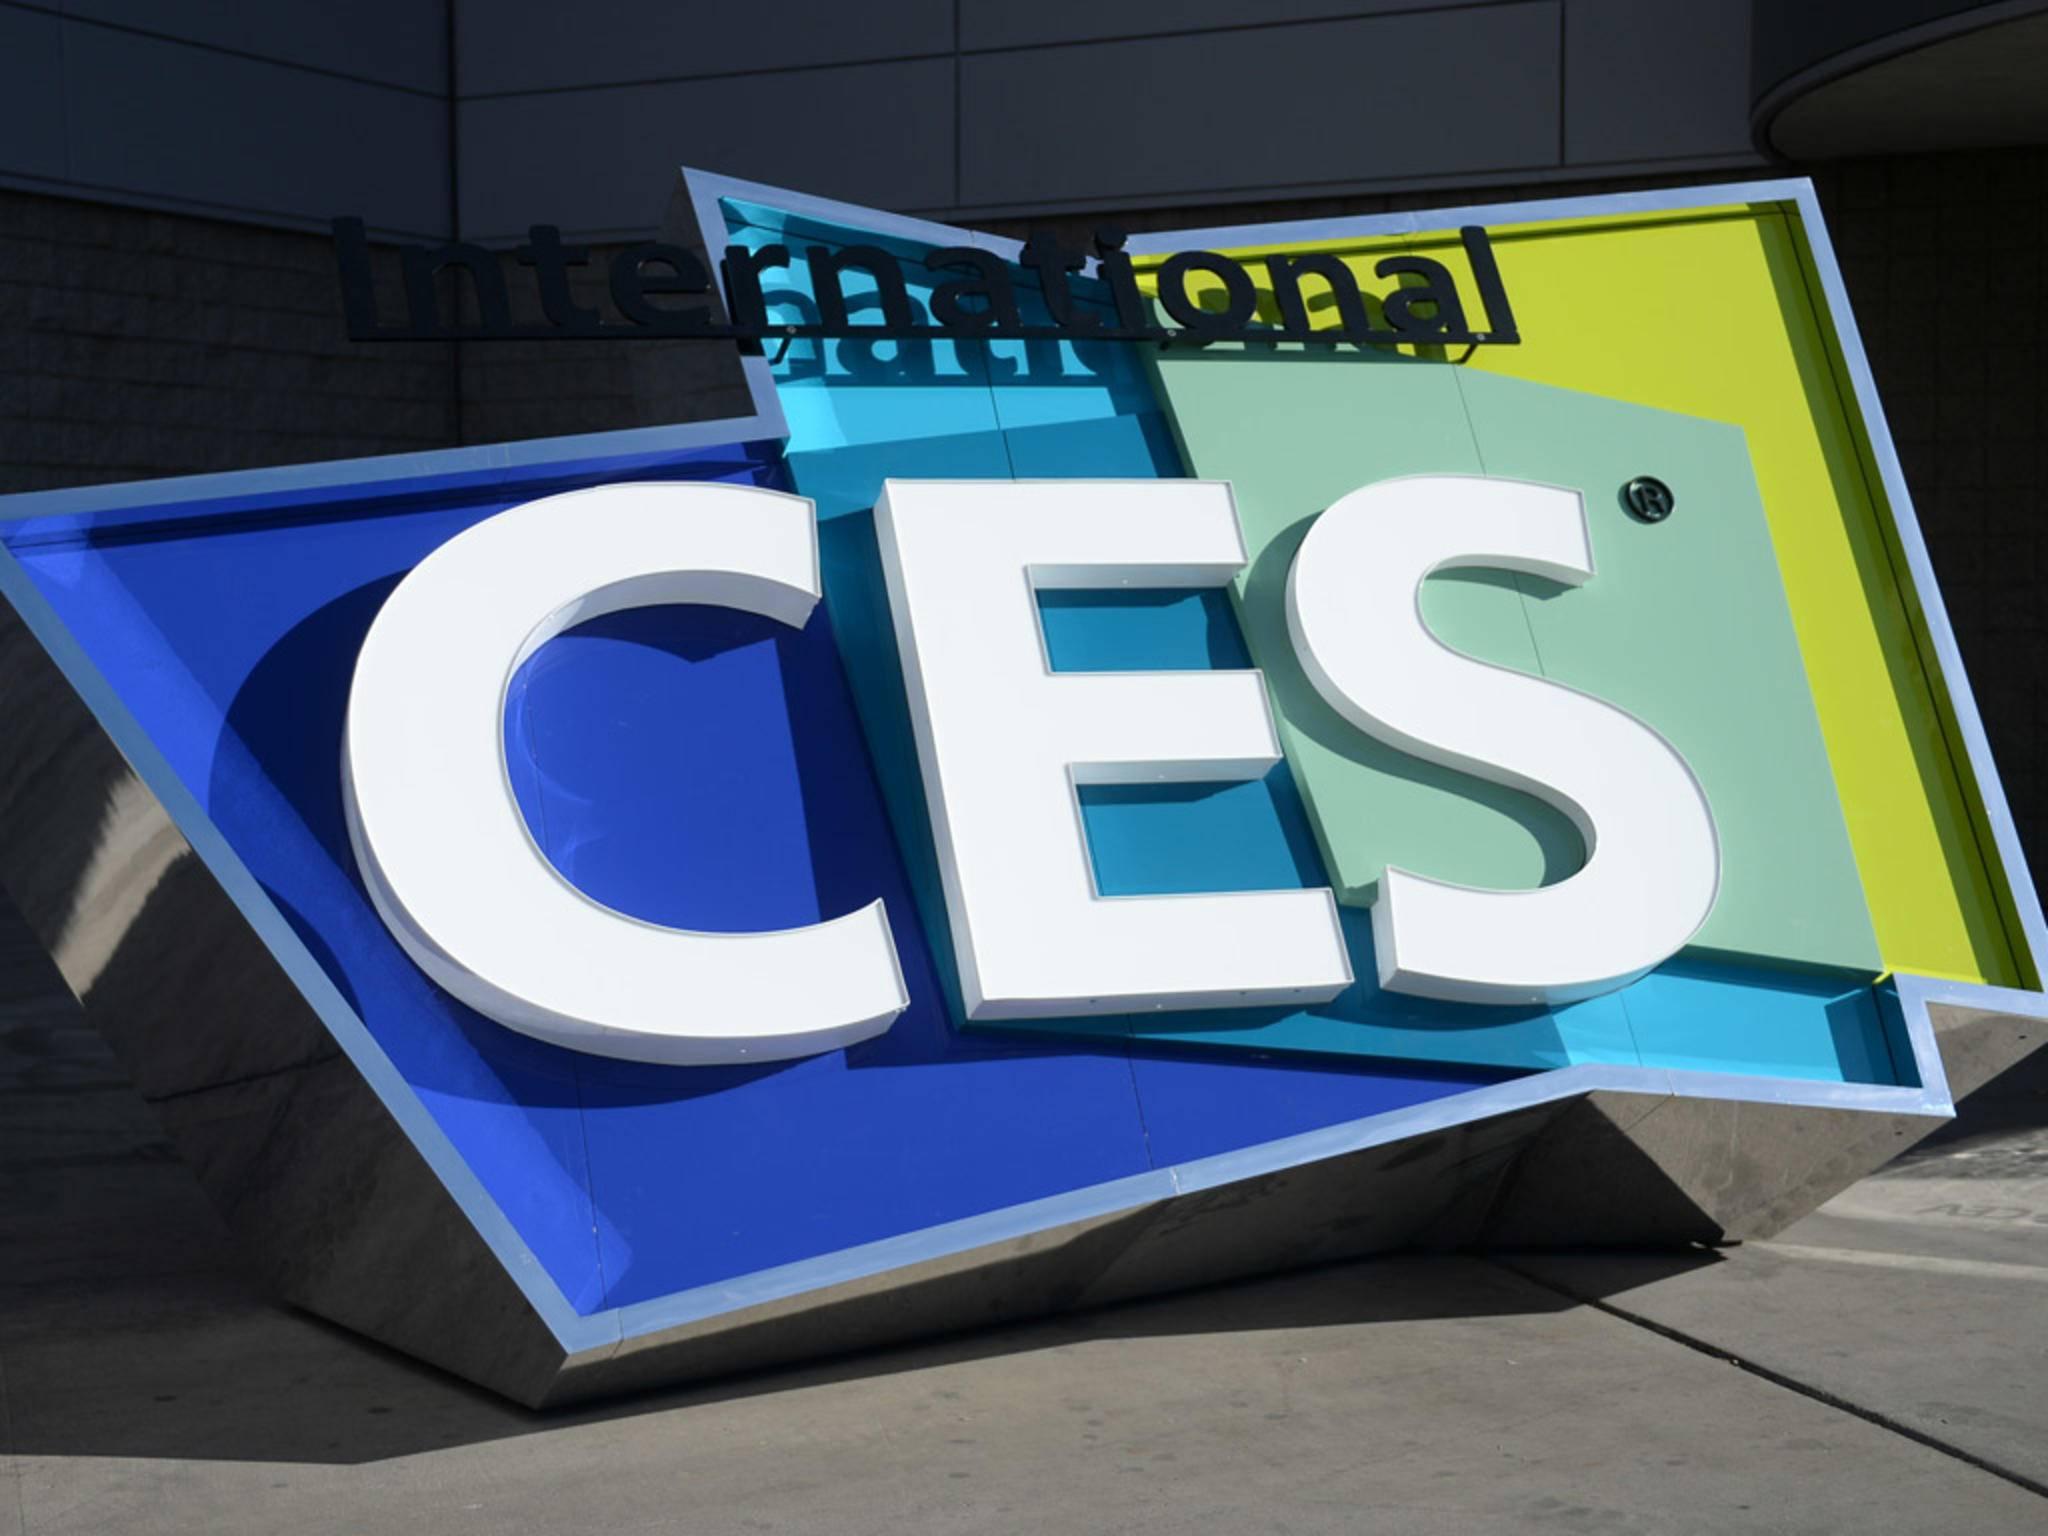 Die CES 2017 startet am 5. Januar.